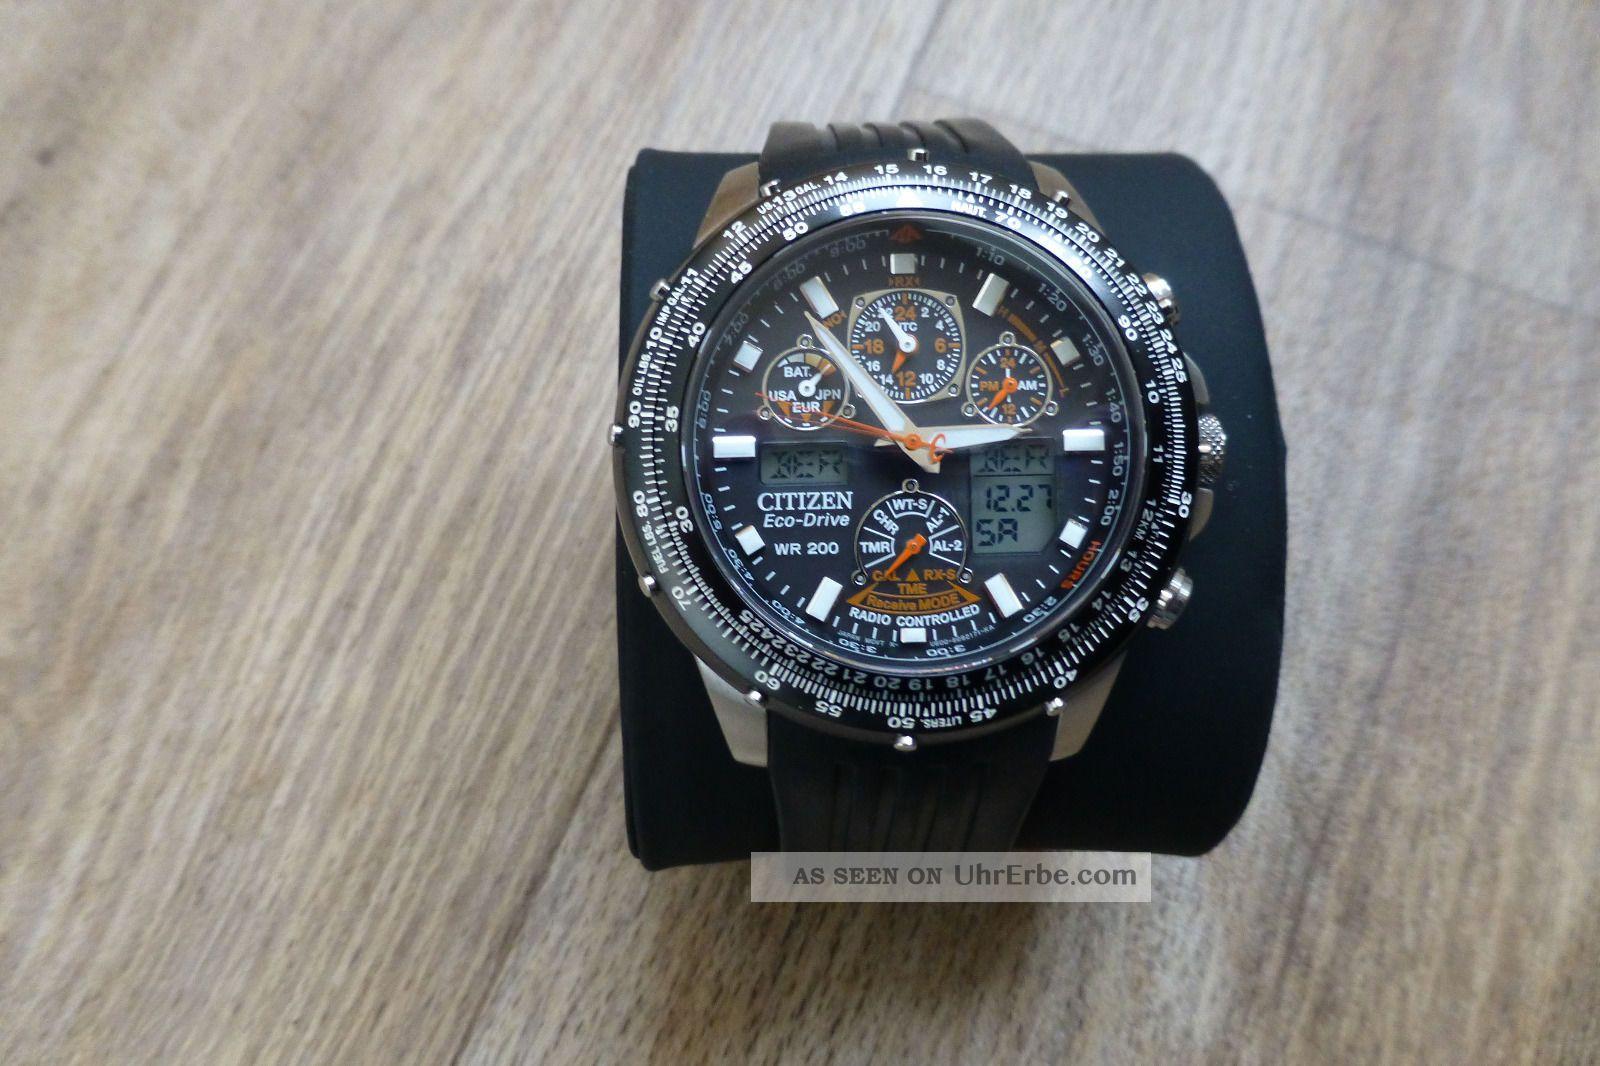 Citizen Eco - Drive Funkuhr Promaster Sky Jy0020 - 64ebr Mit 2 Armbändern Armbanduhren Bild